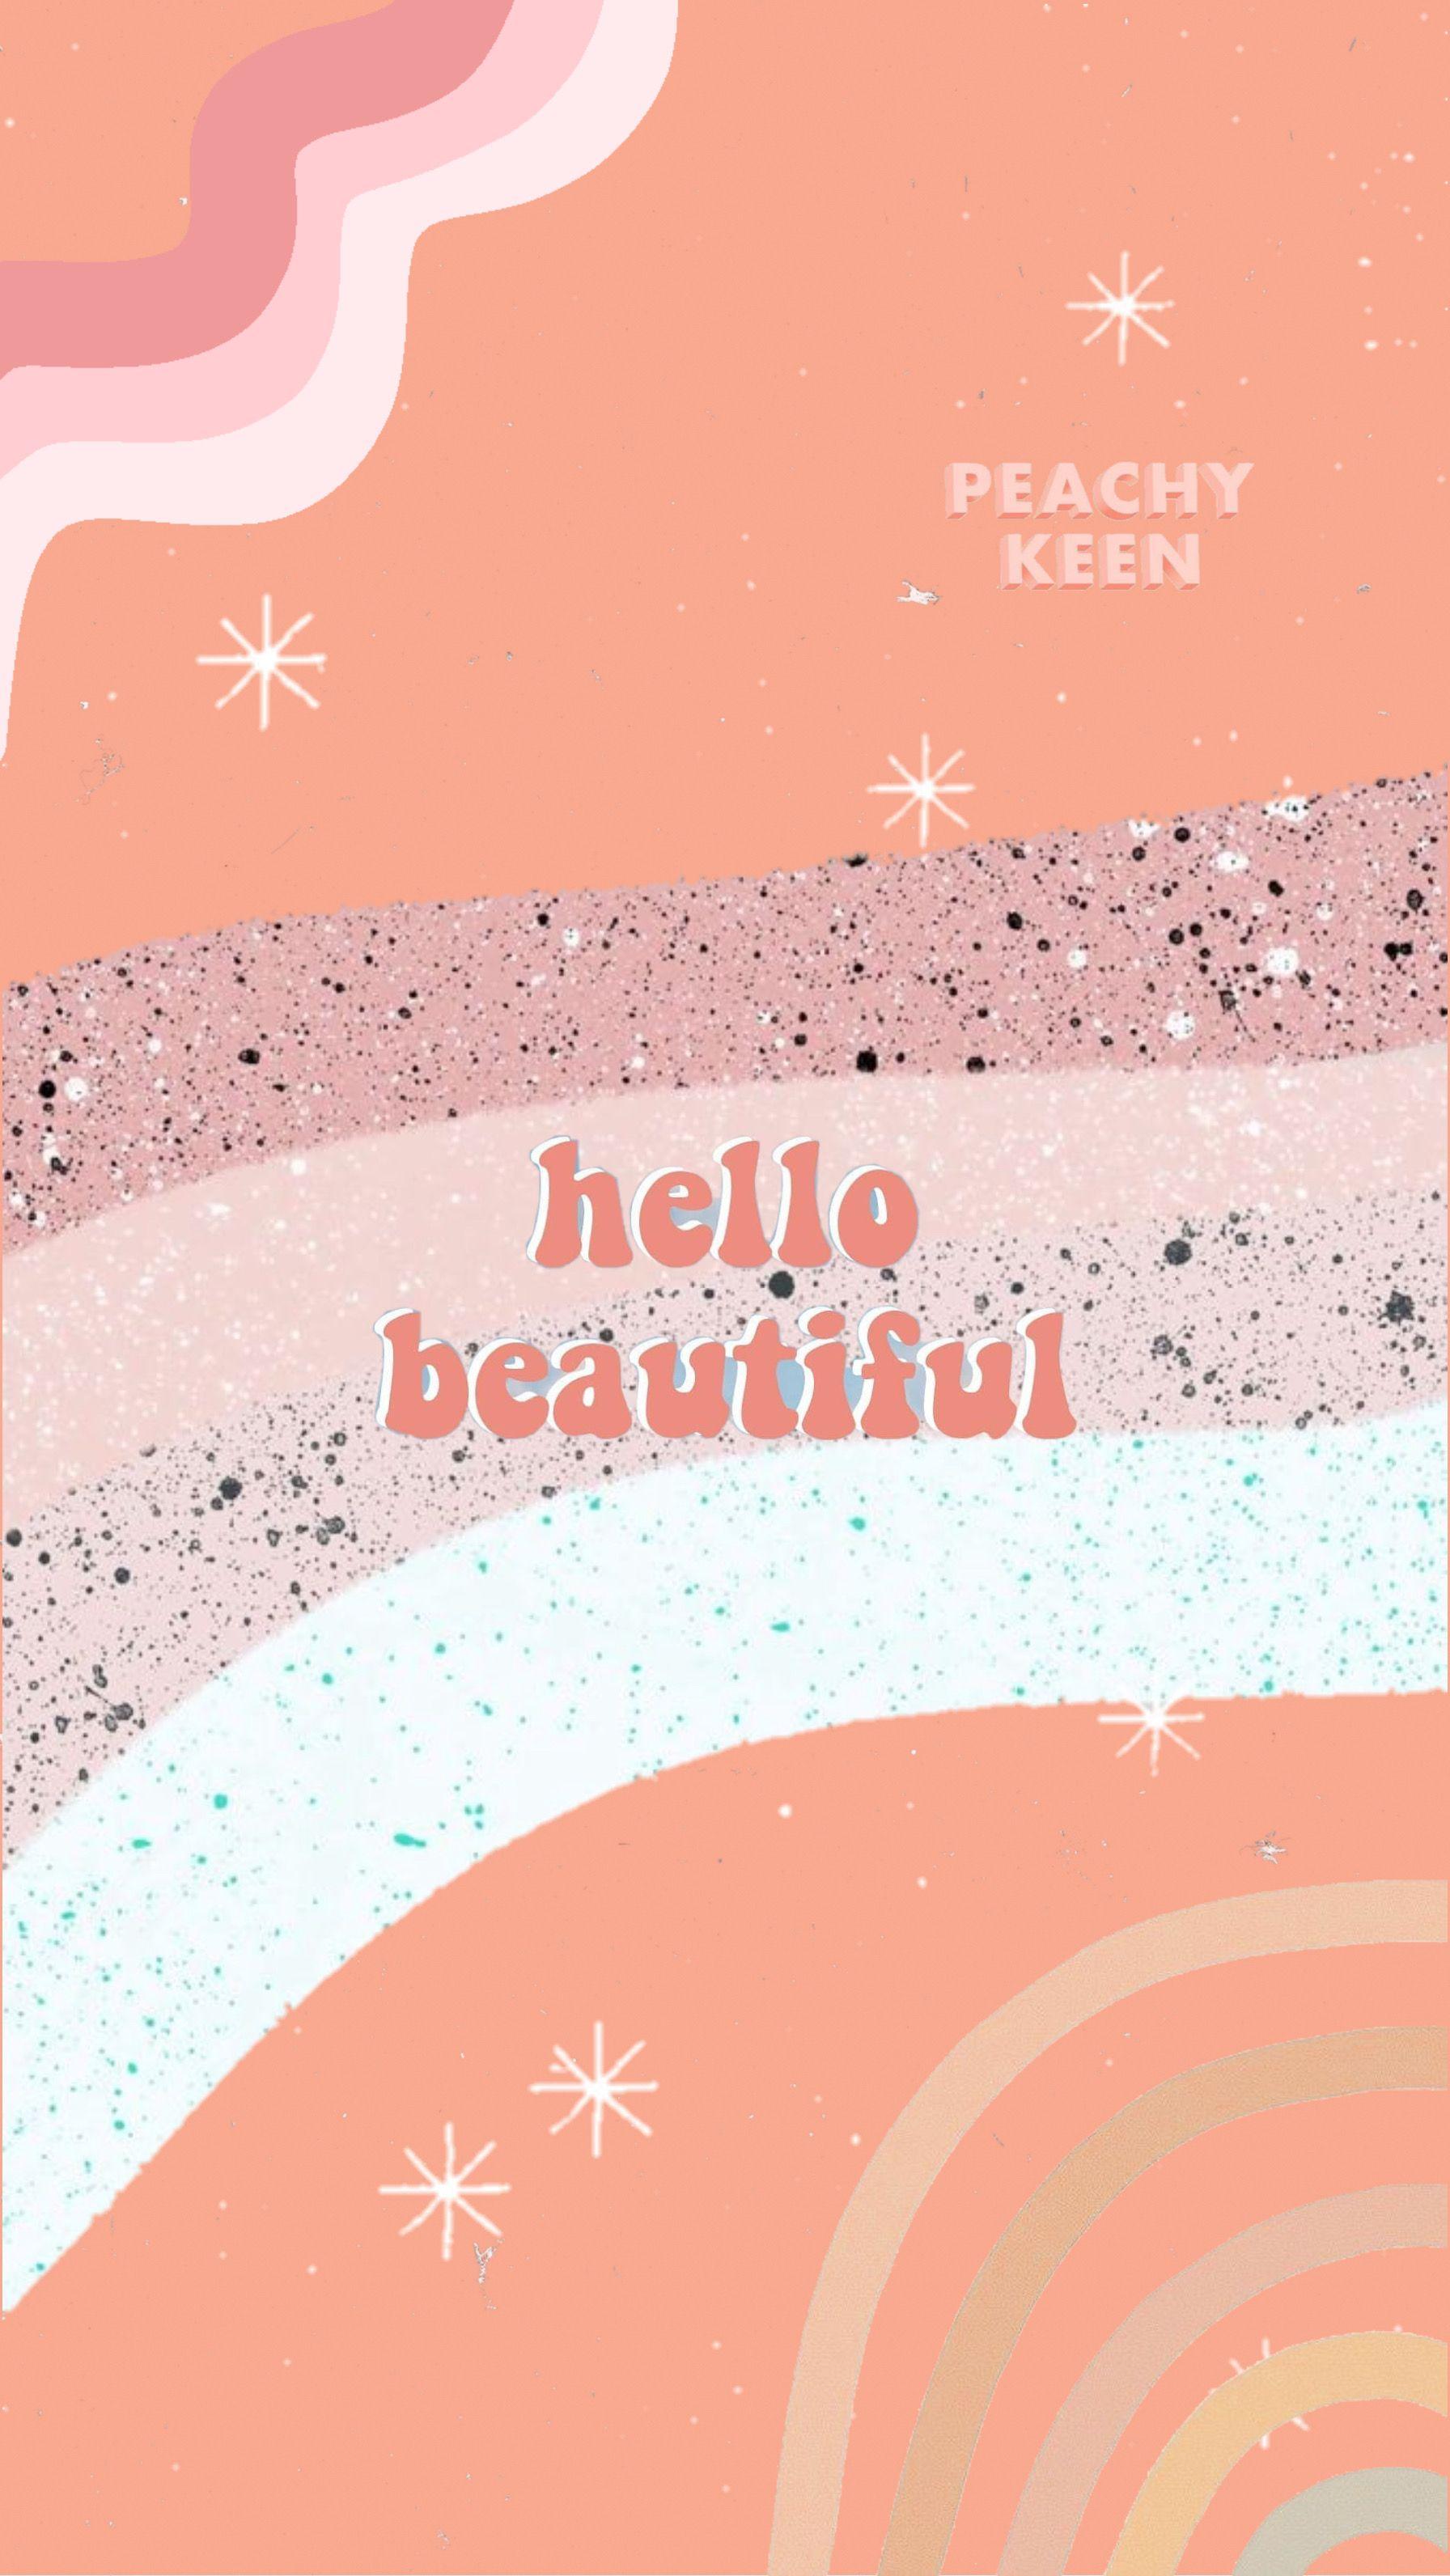 Wallpaper Aesthetic Peach Peach Wallpaper Kawaii Wallpaper Aesthetic Iphone Wallpaper